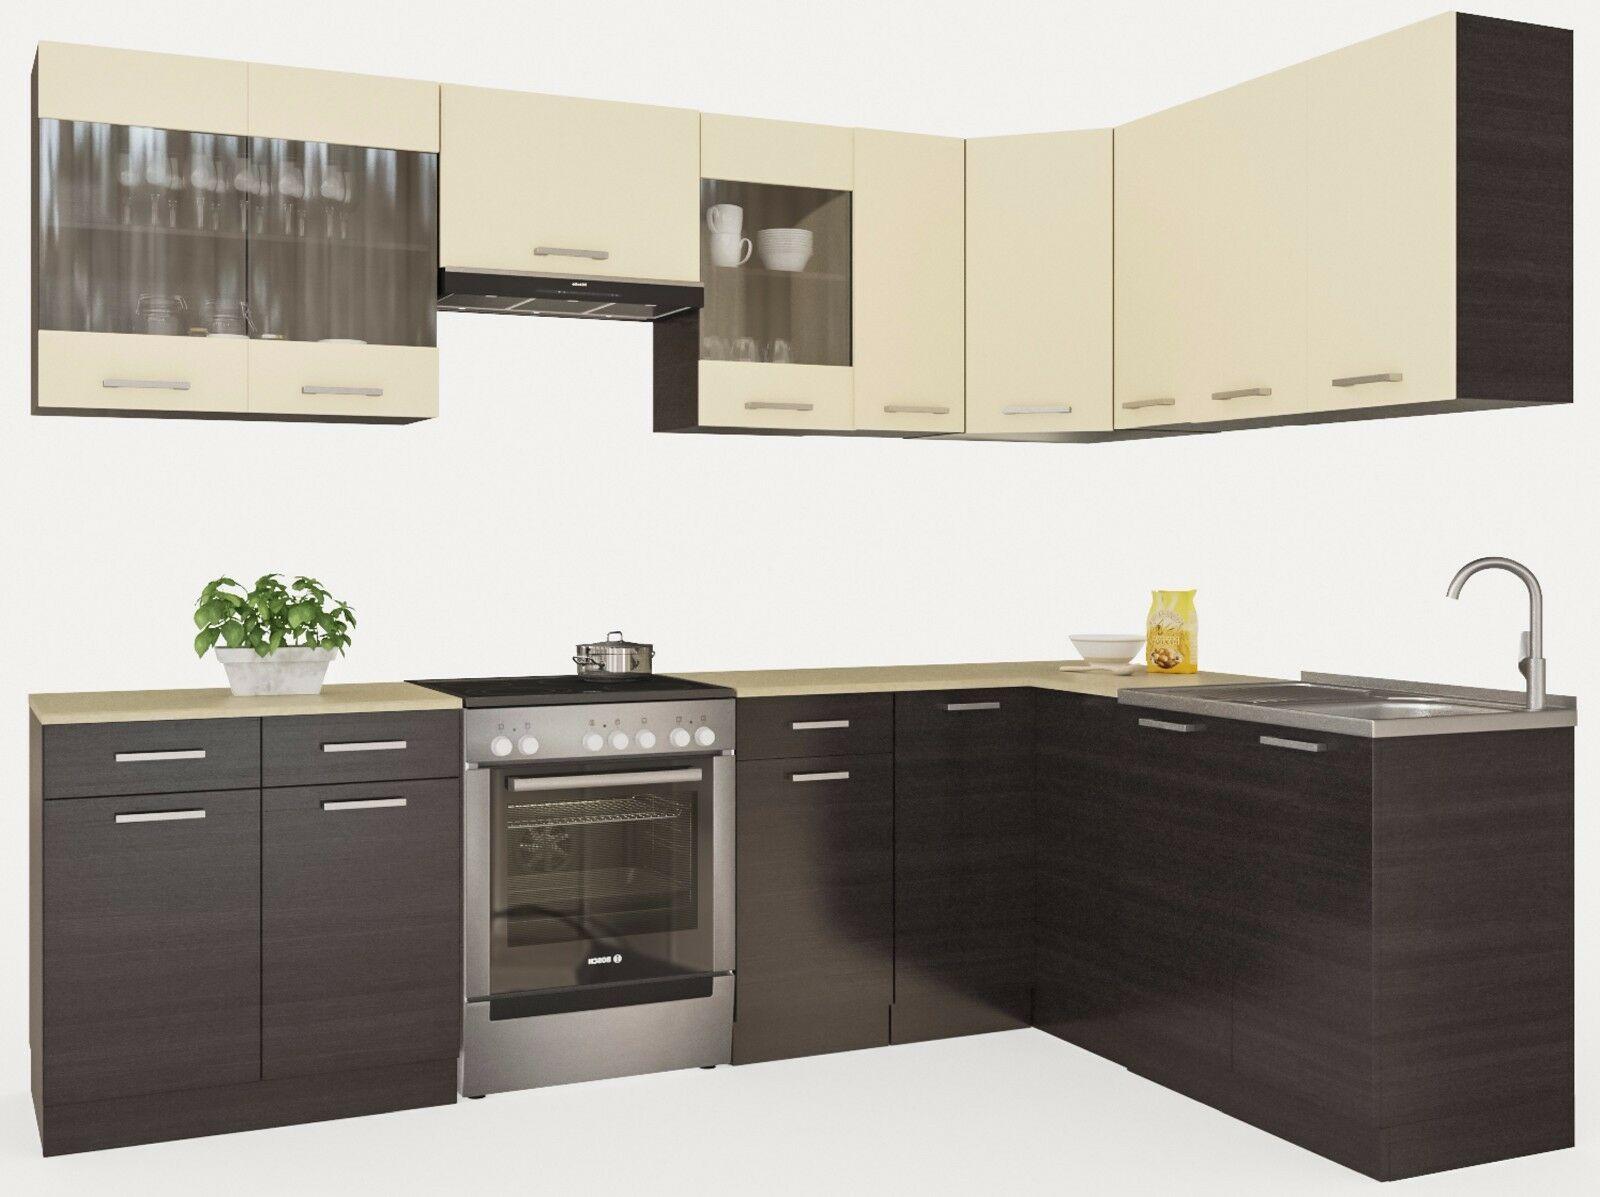 Full Size of Ikea Küche L Form Küche L Form Modern Küche L Form Gebraucht Küche L Form Ohne Kühlschrank Küche Küche L Form